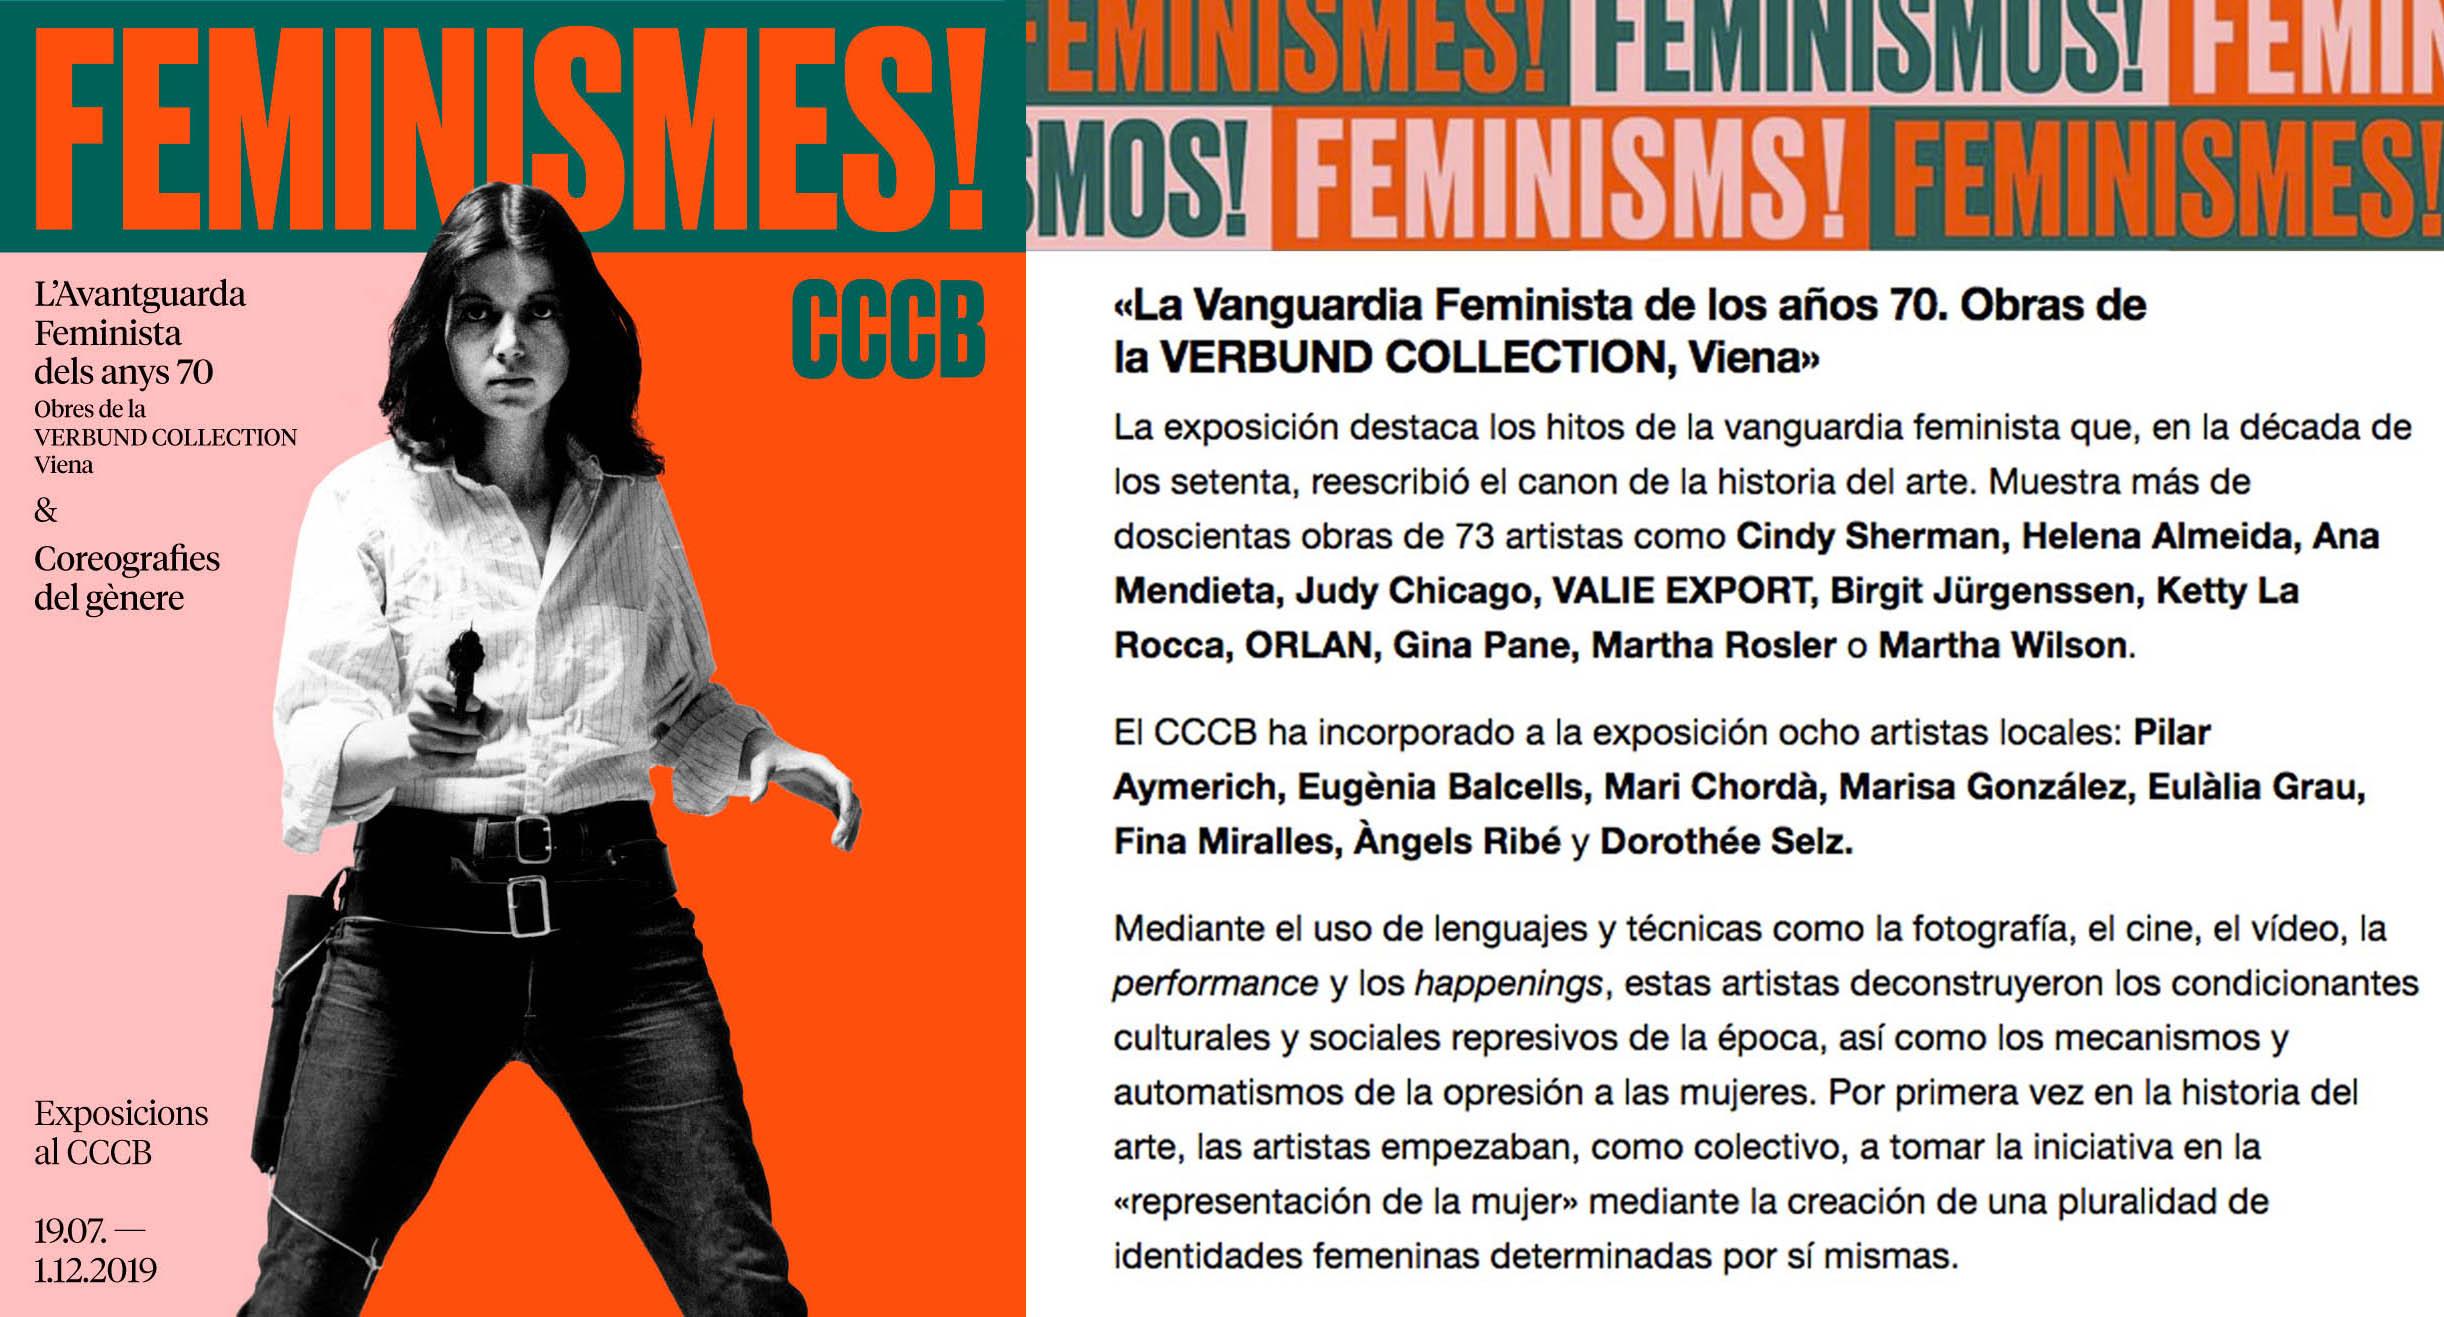 Feminismes 1